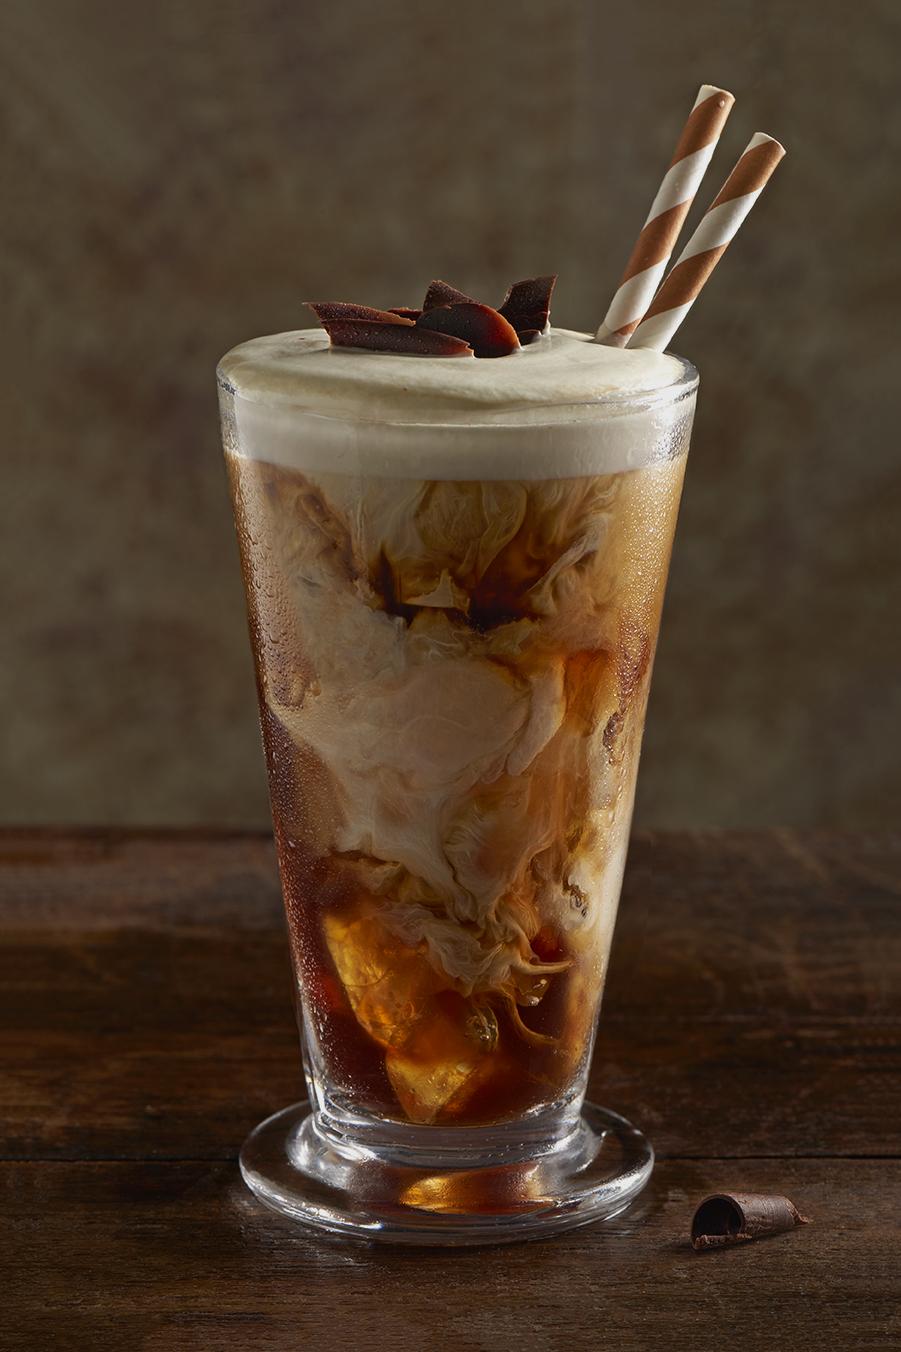 Indulgent iced coffee